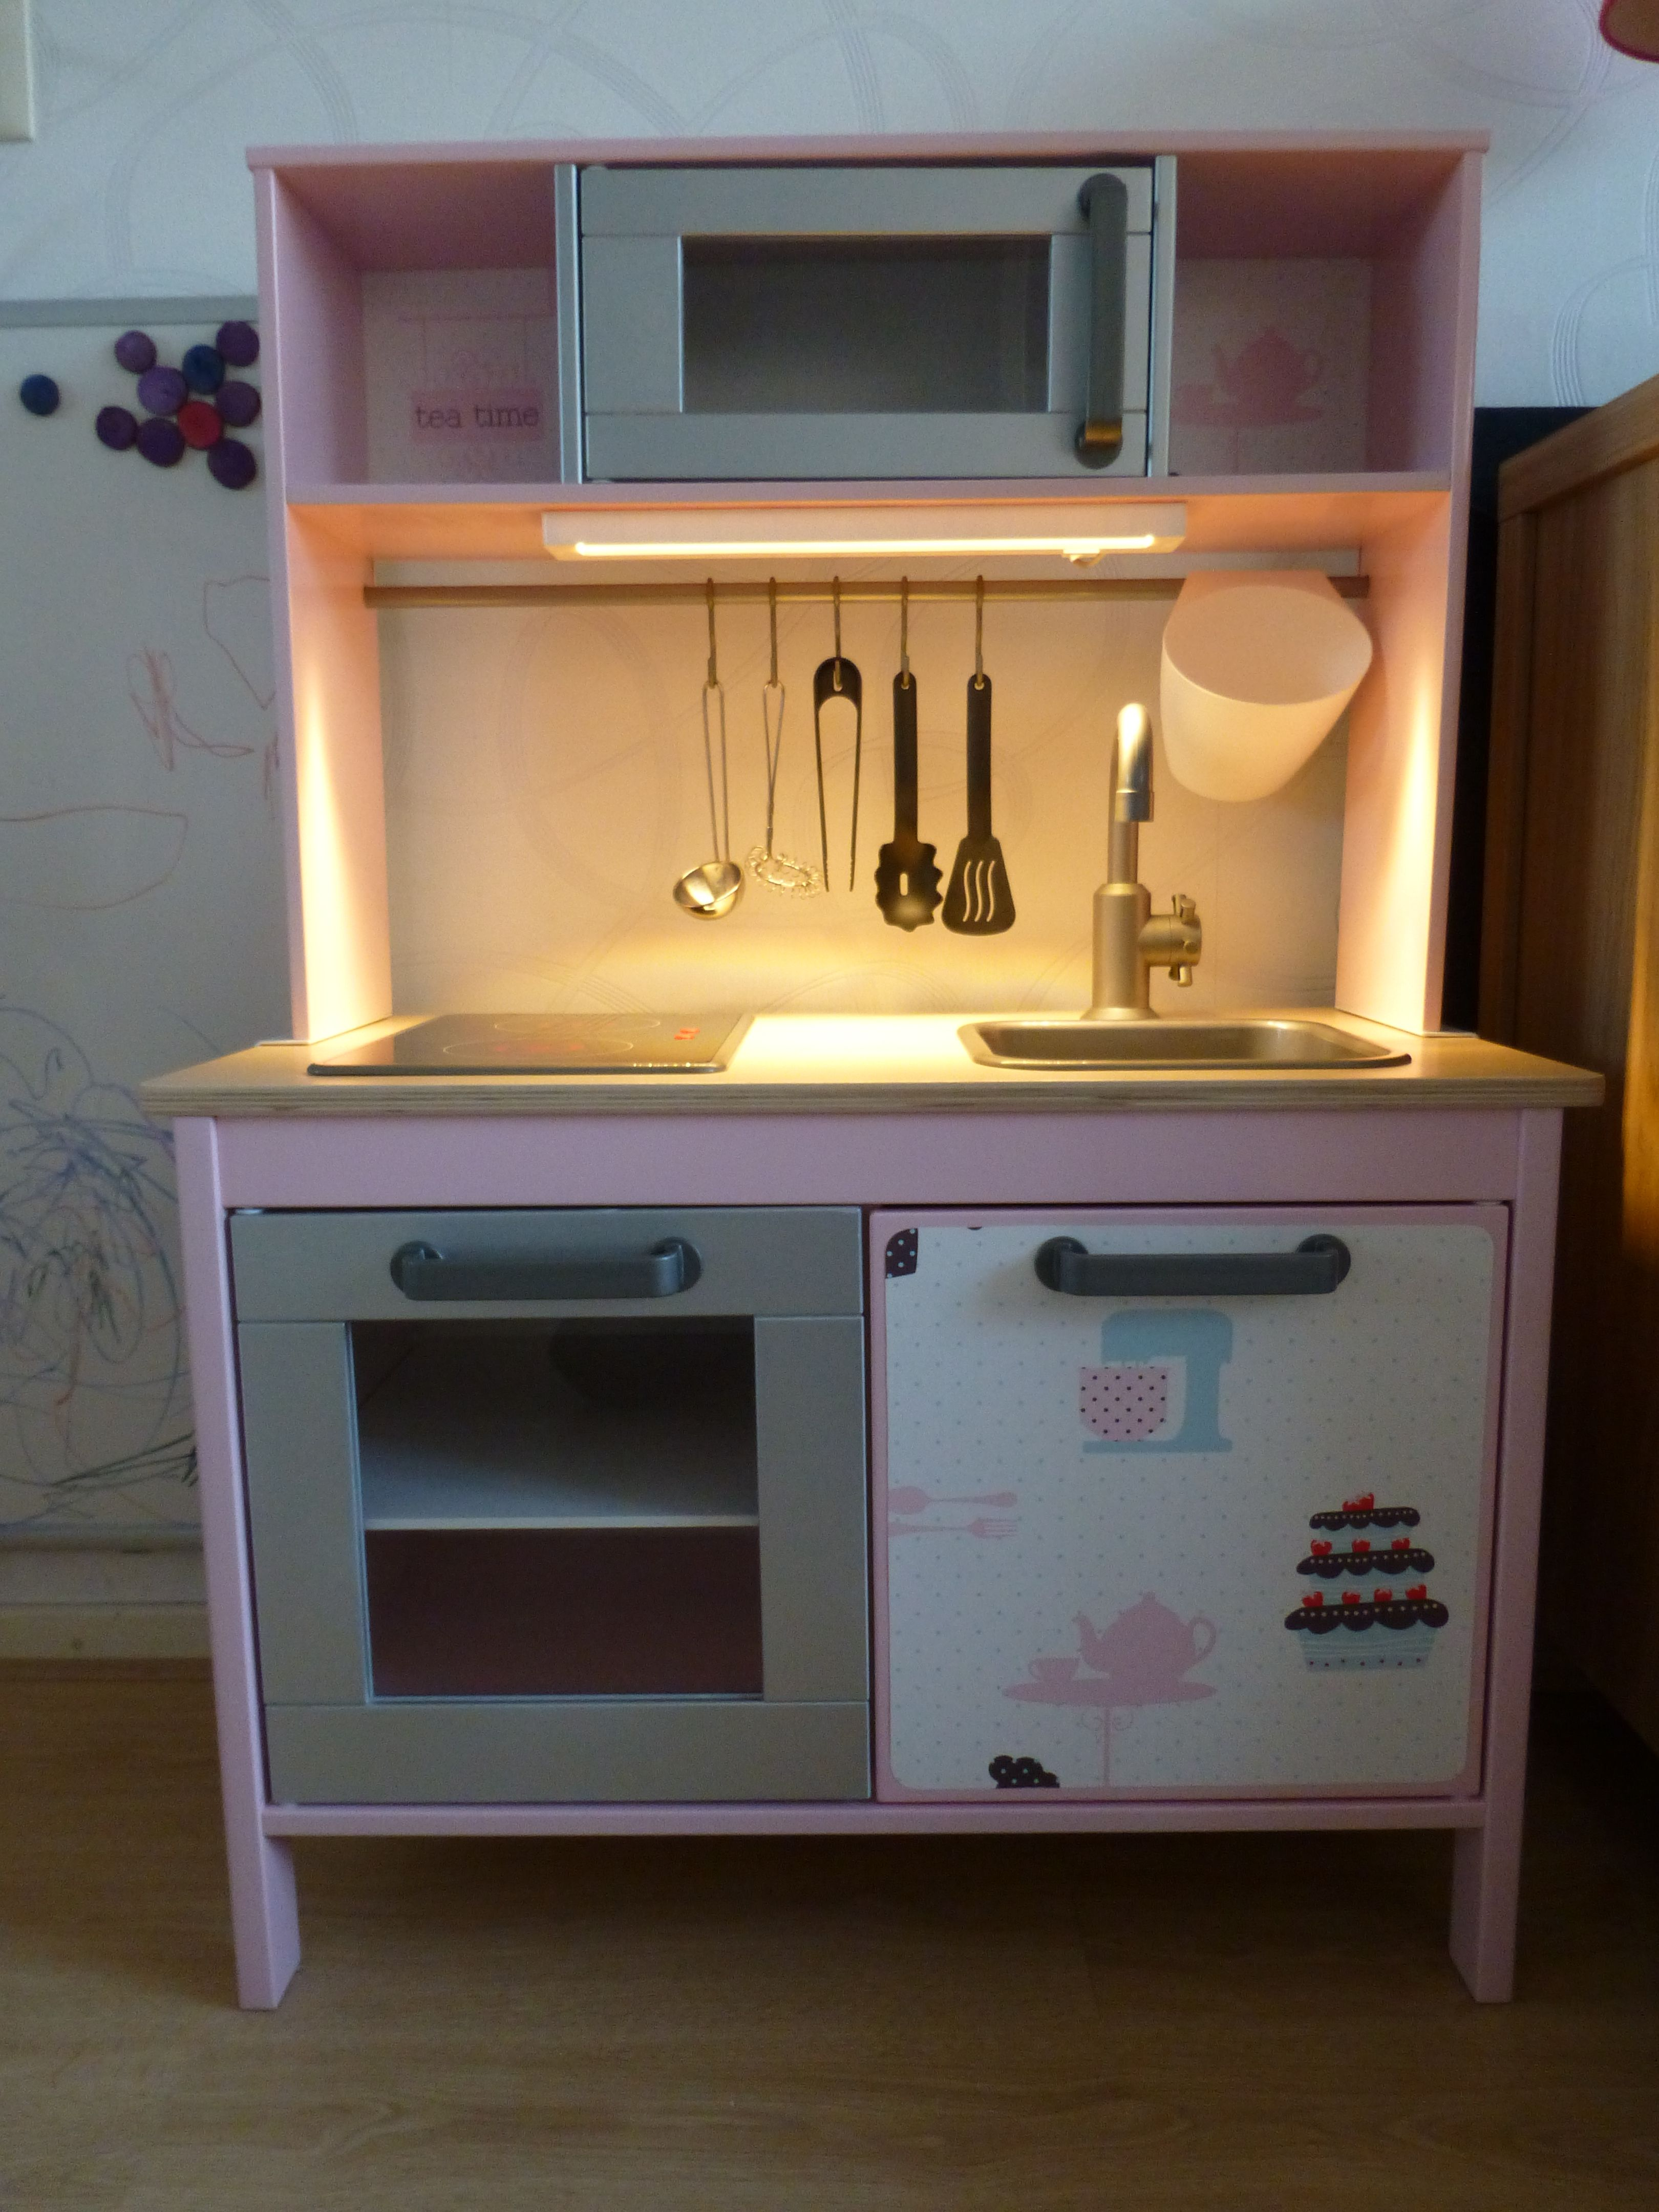 Wendy S 2e Verjaardags Kado Gepimpt Ikea Duktig Keukentje 3